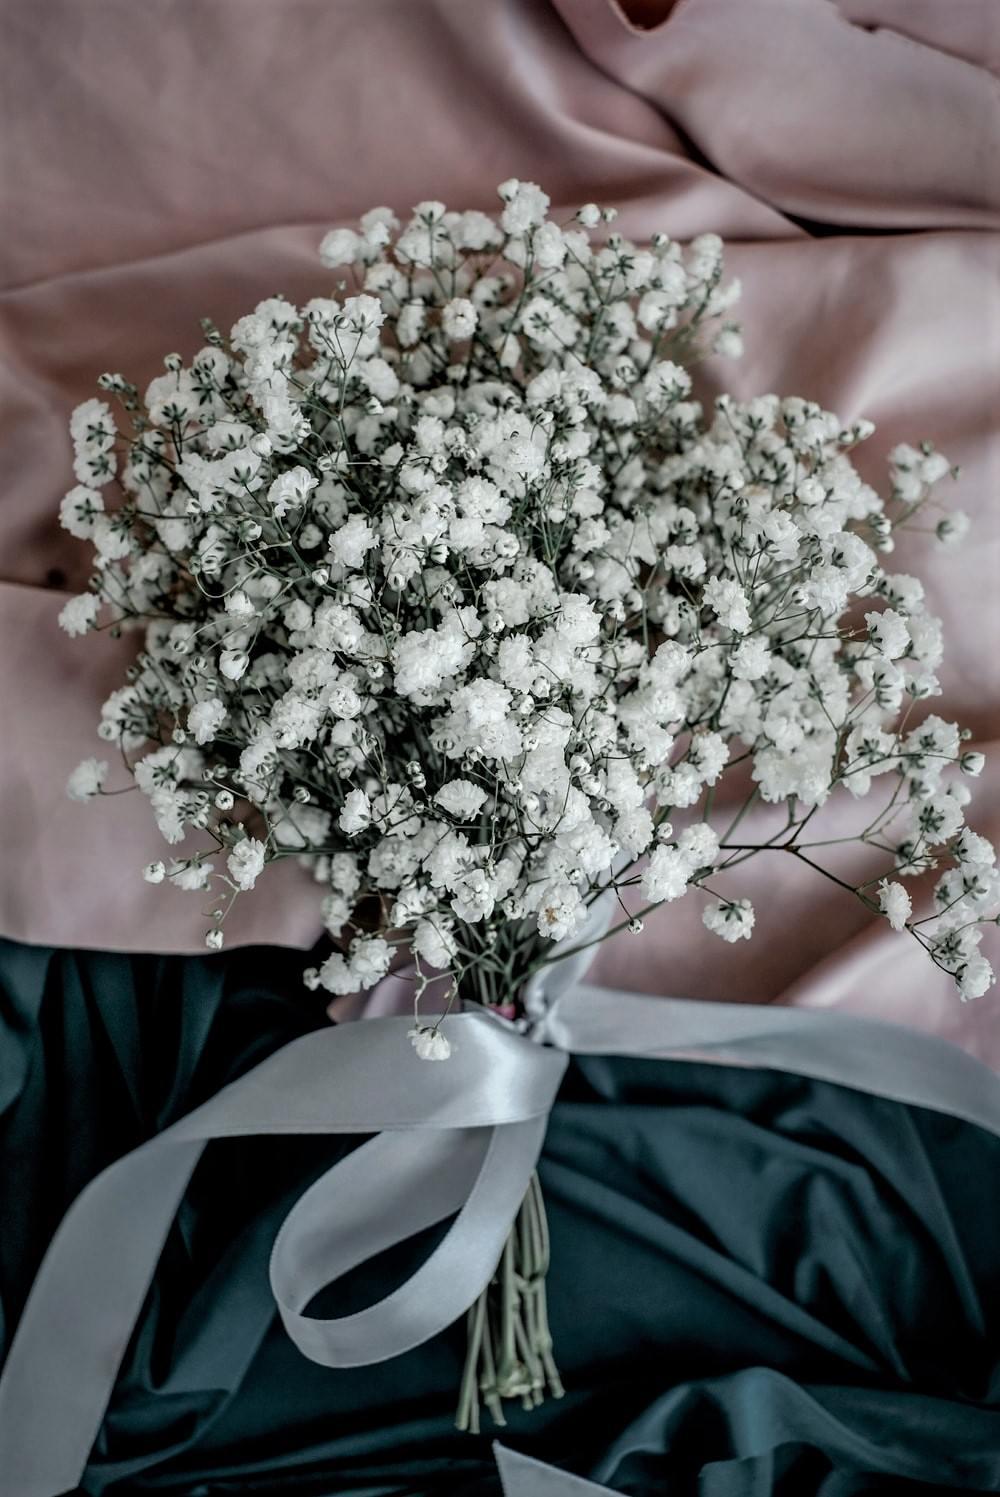 Bouquet Flowers Bride Bridal Bridesmaid Gyp Gypsophila Philippines Wedding The Backyard Studios